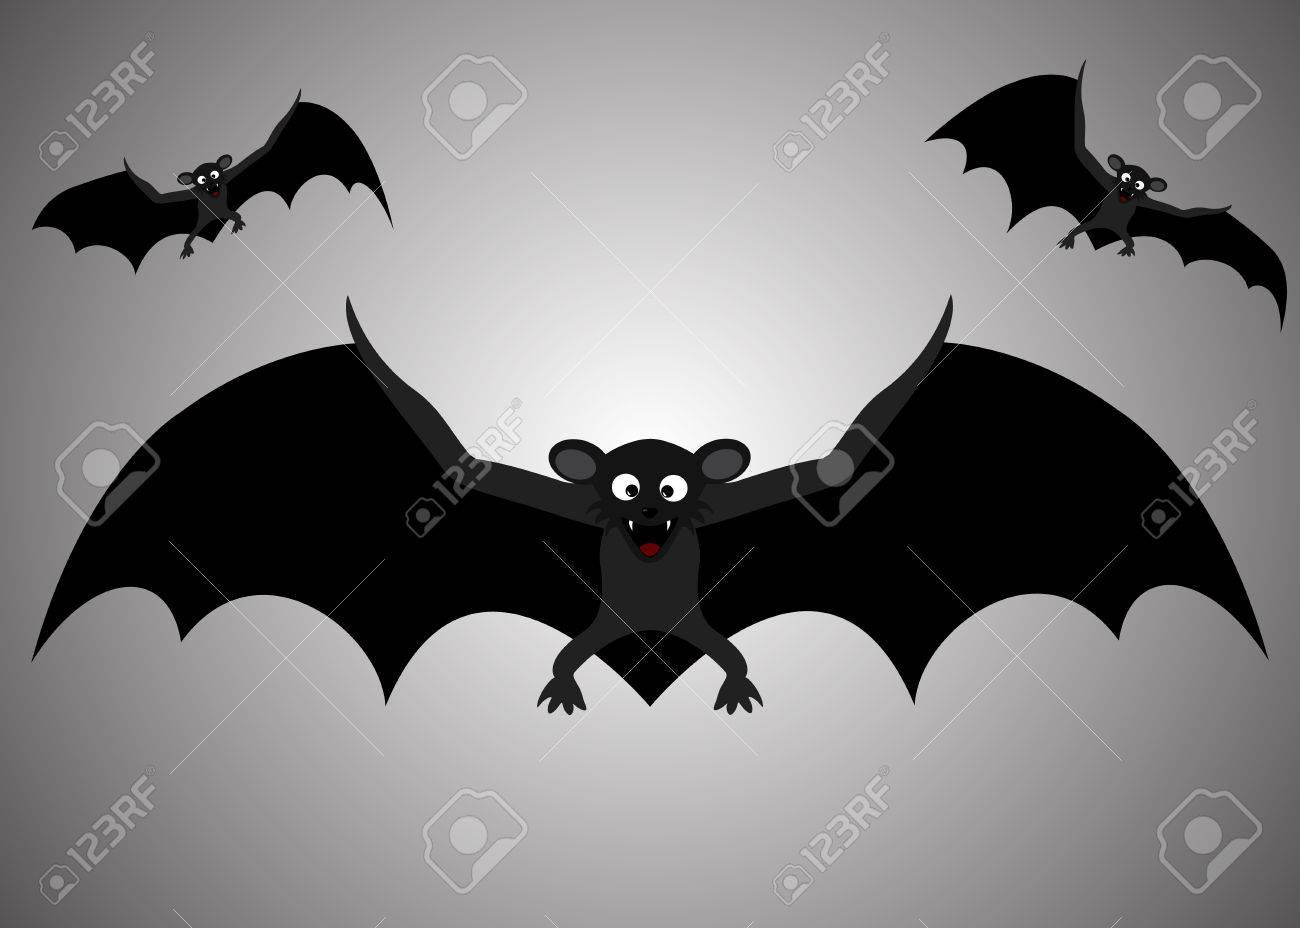 halloween bats flight of a bat vector illustrations stock vector 47530310 - Halloween Pictures Bats